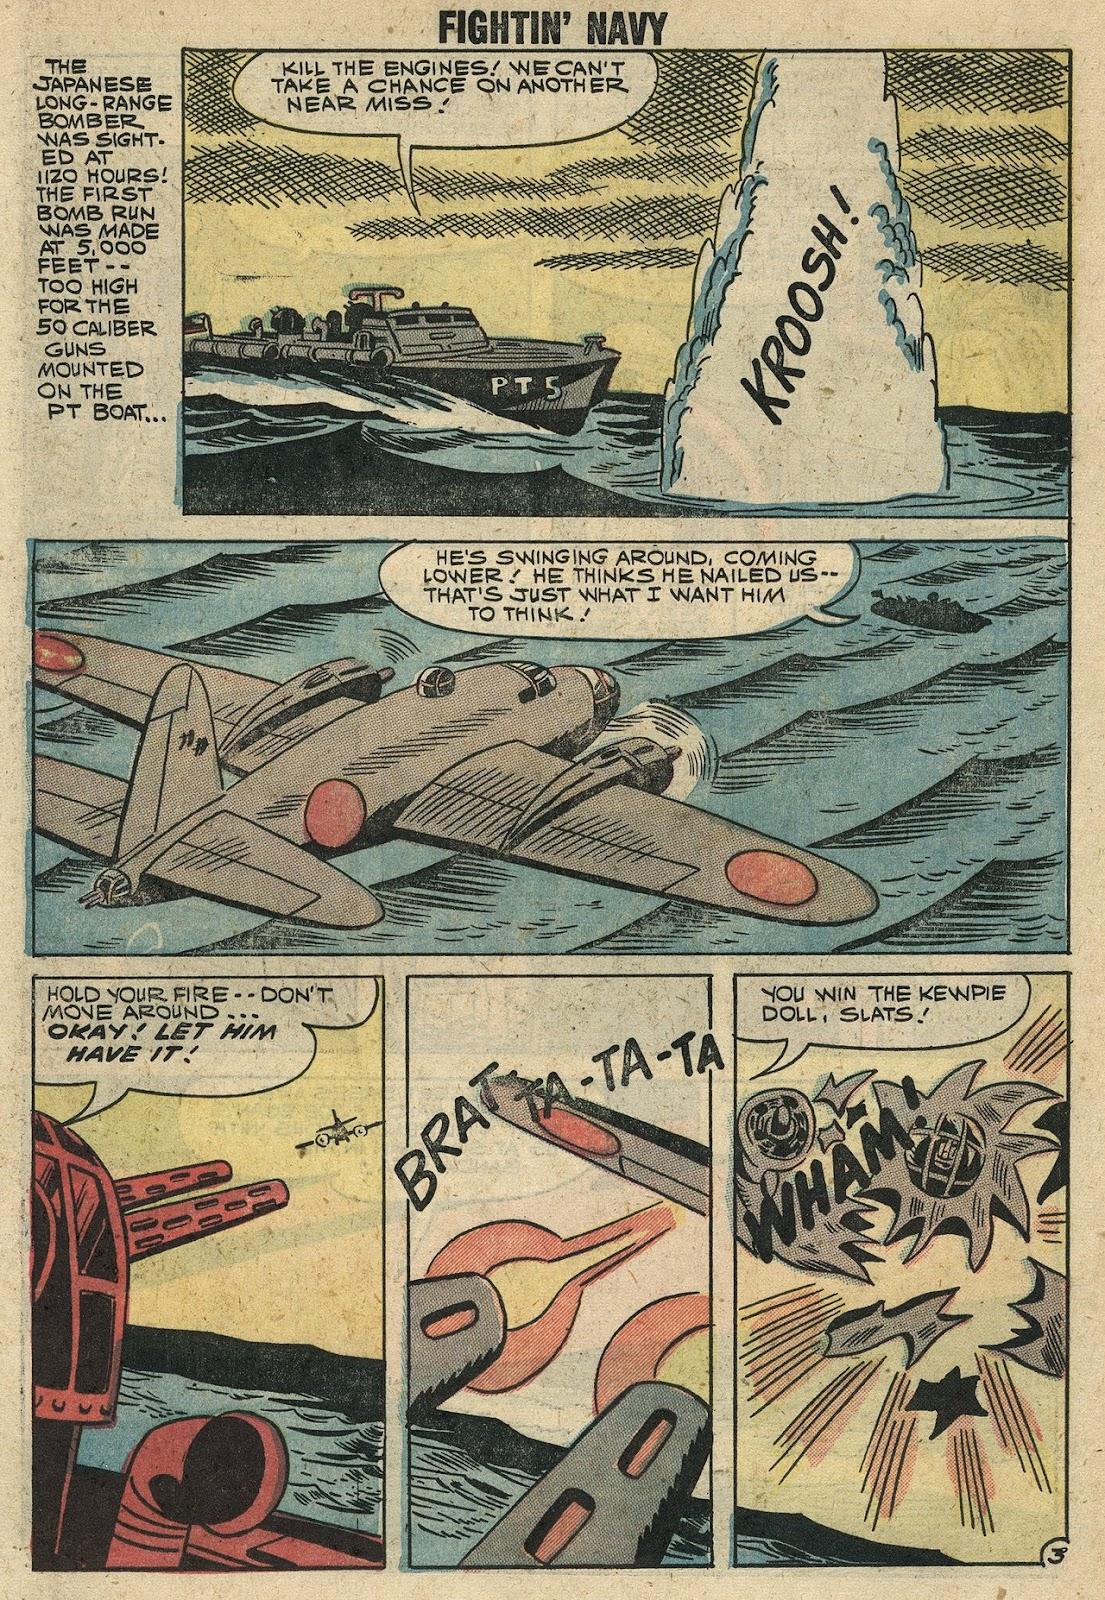 Read online Fightin' Navy comic -  Issue #86 - 17